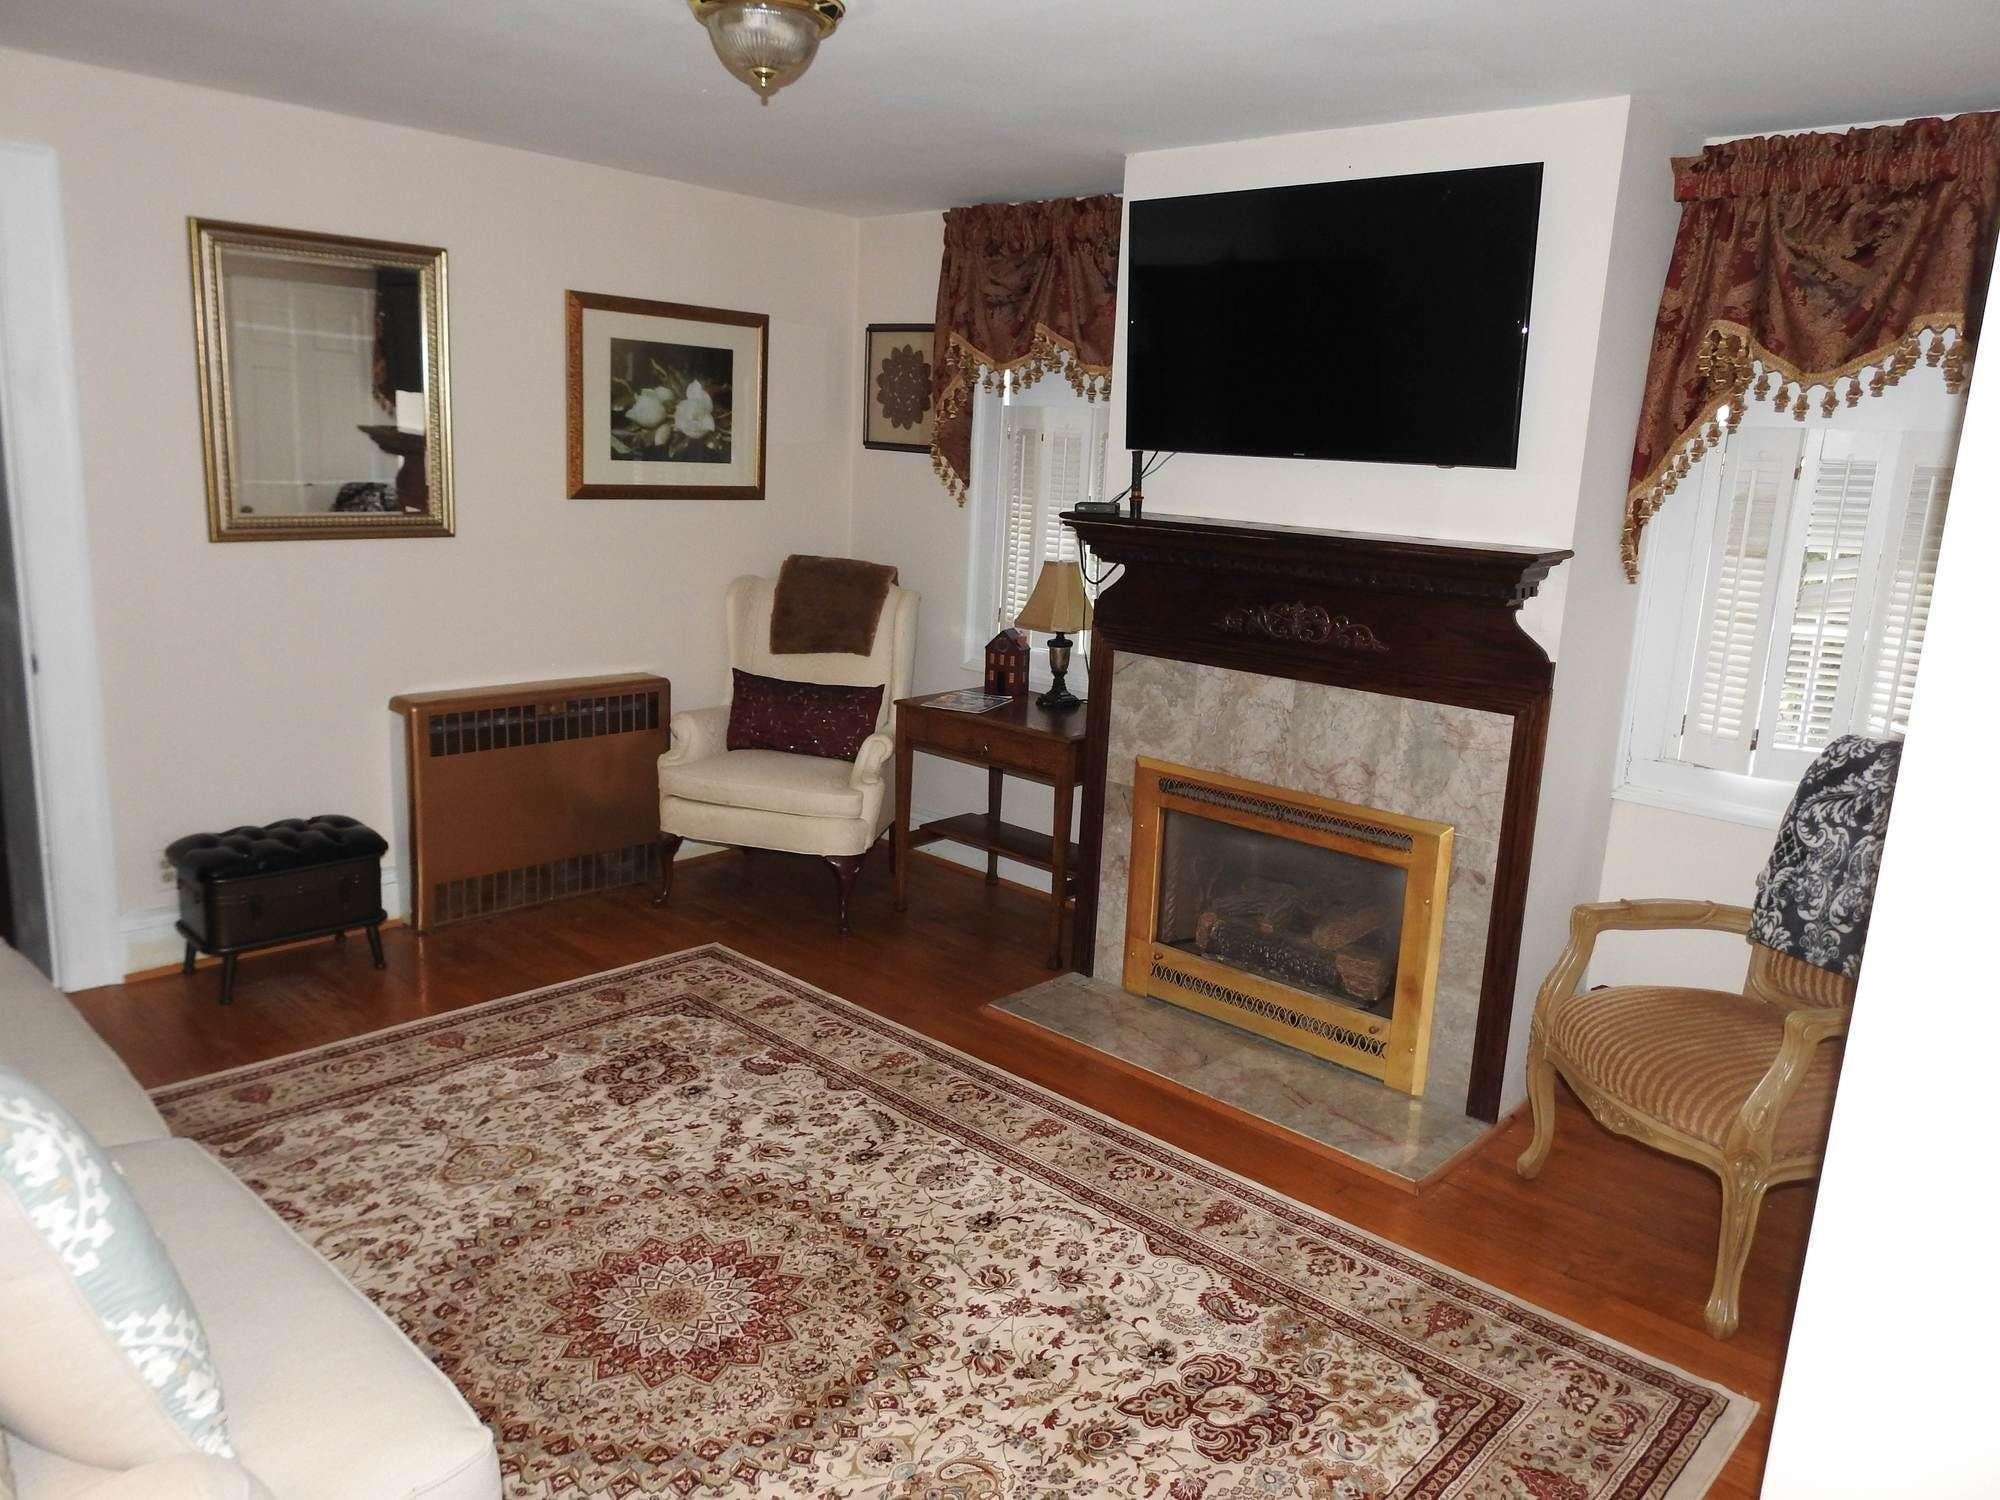 Magnolia Manor Bed and Breakfast Inn